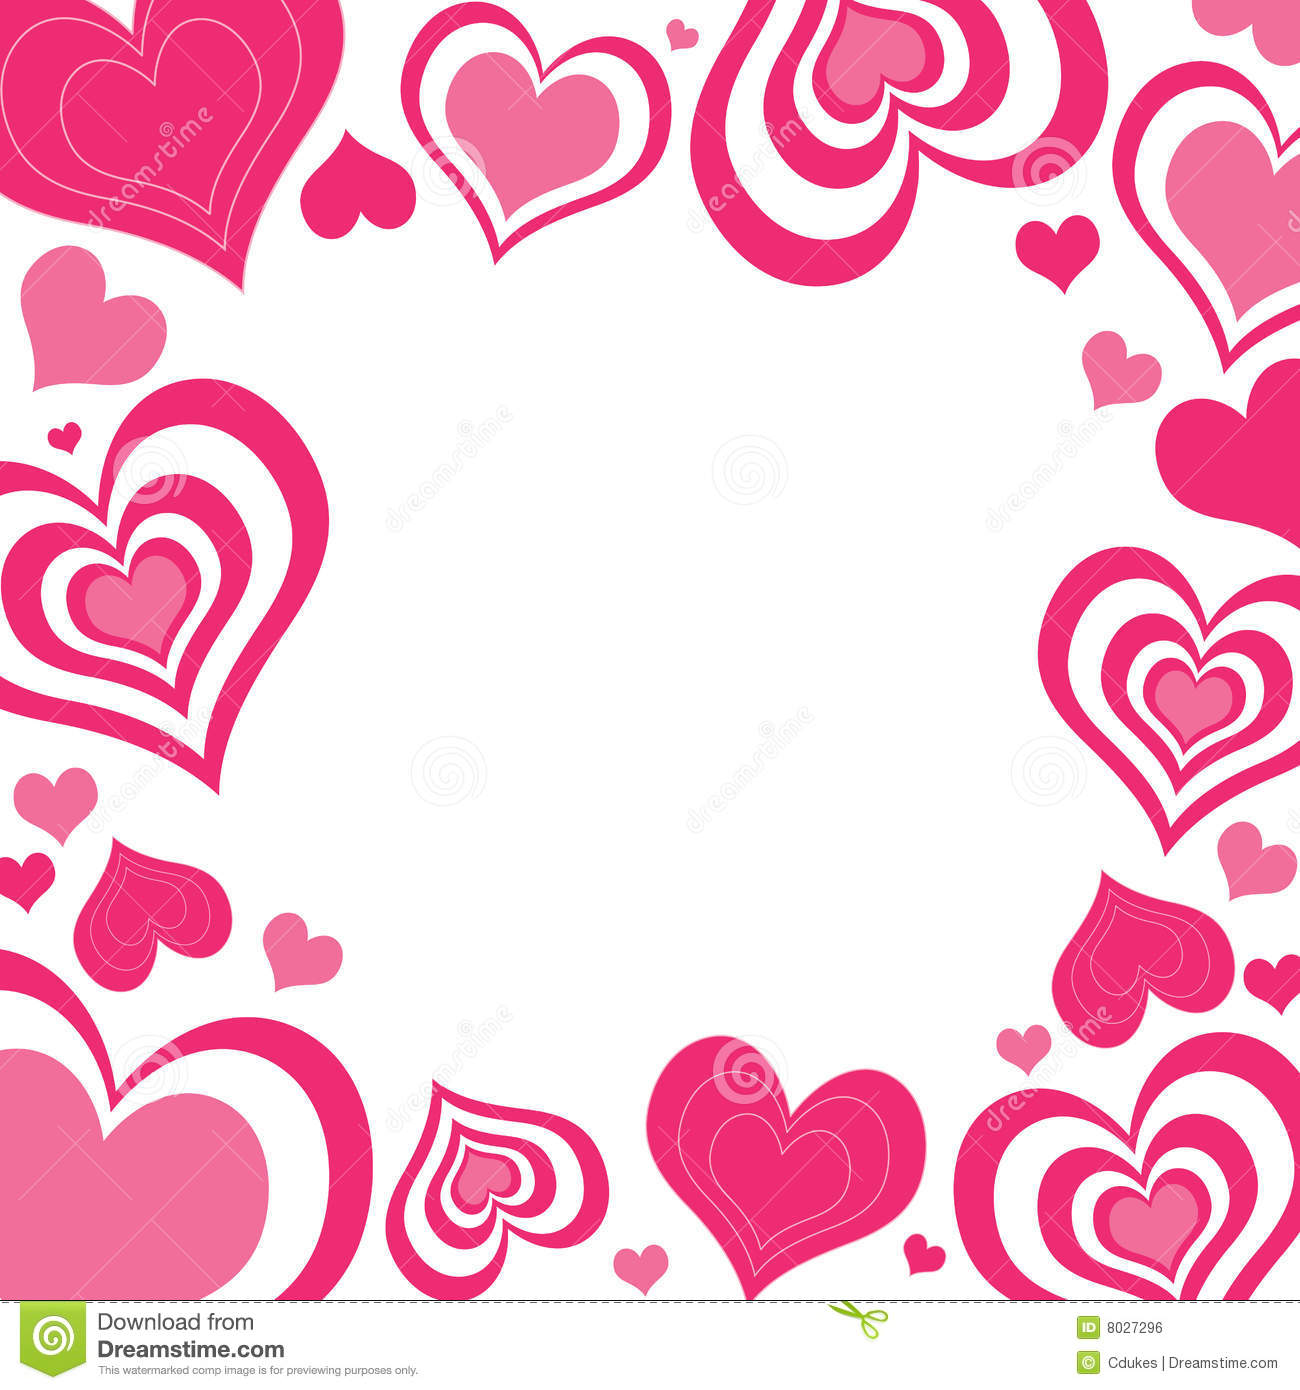 Valentine Hearts Border Royalty Free Stock Image Image 8027296